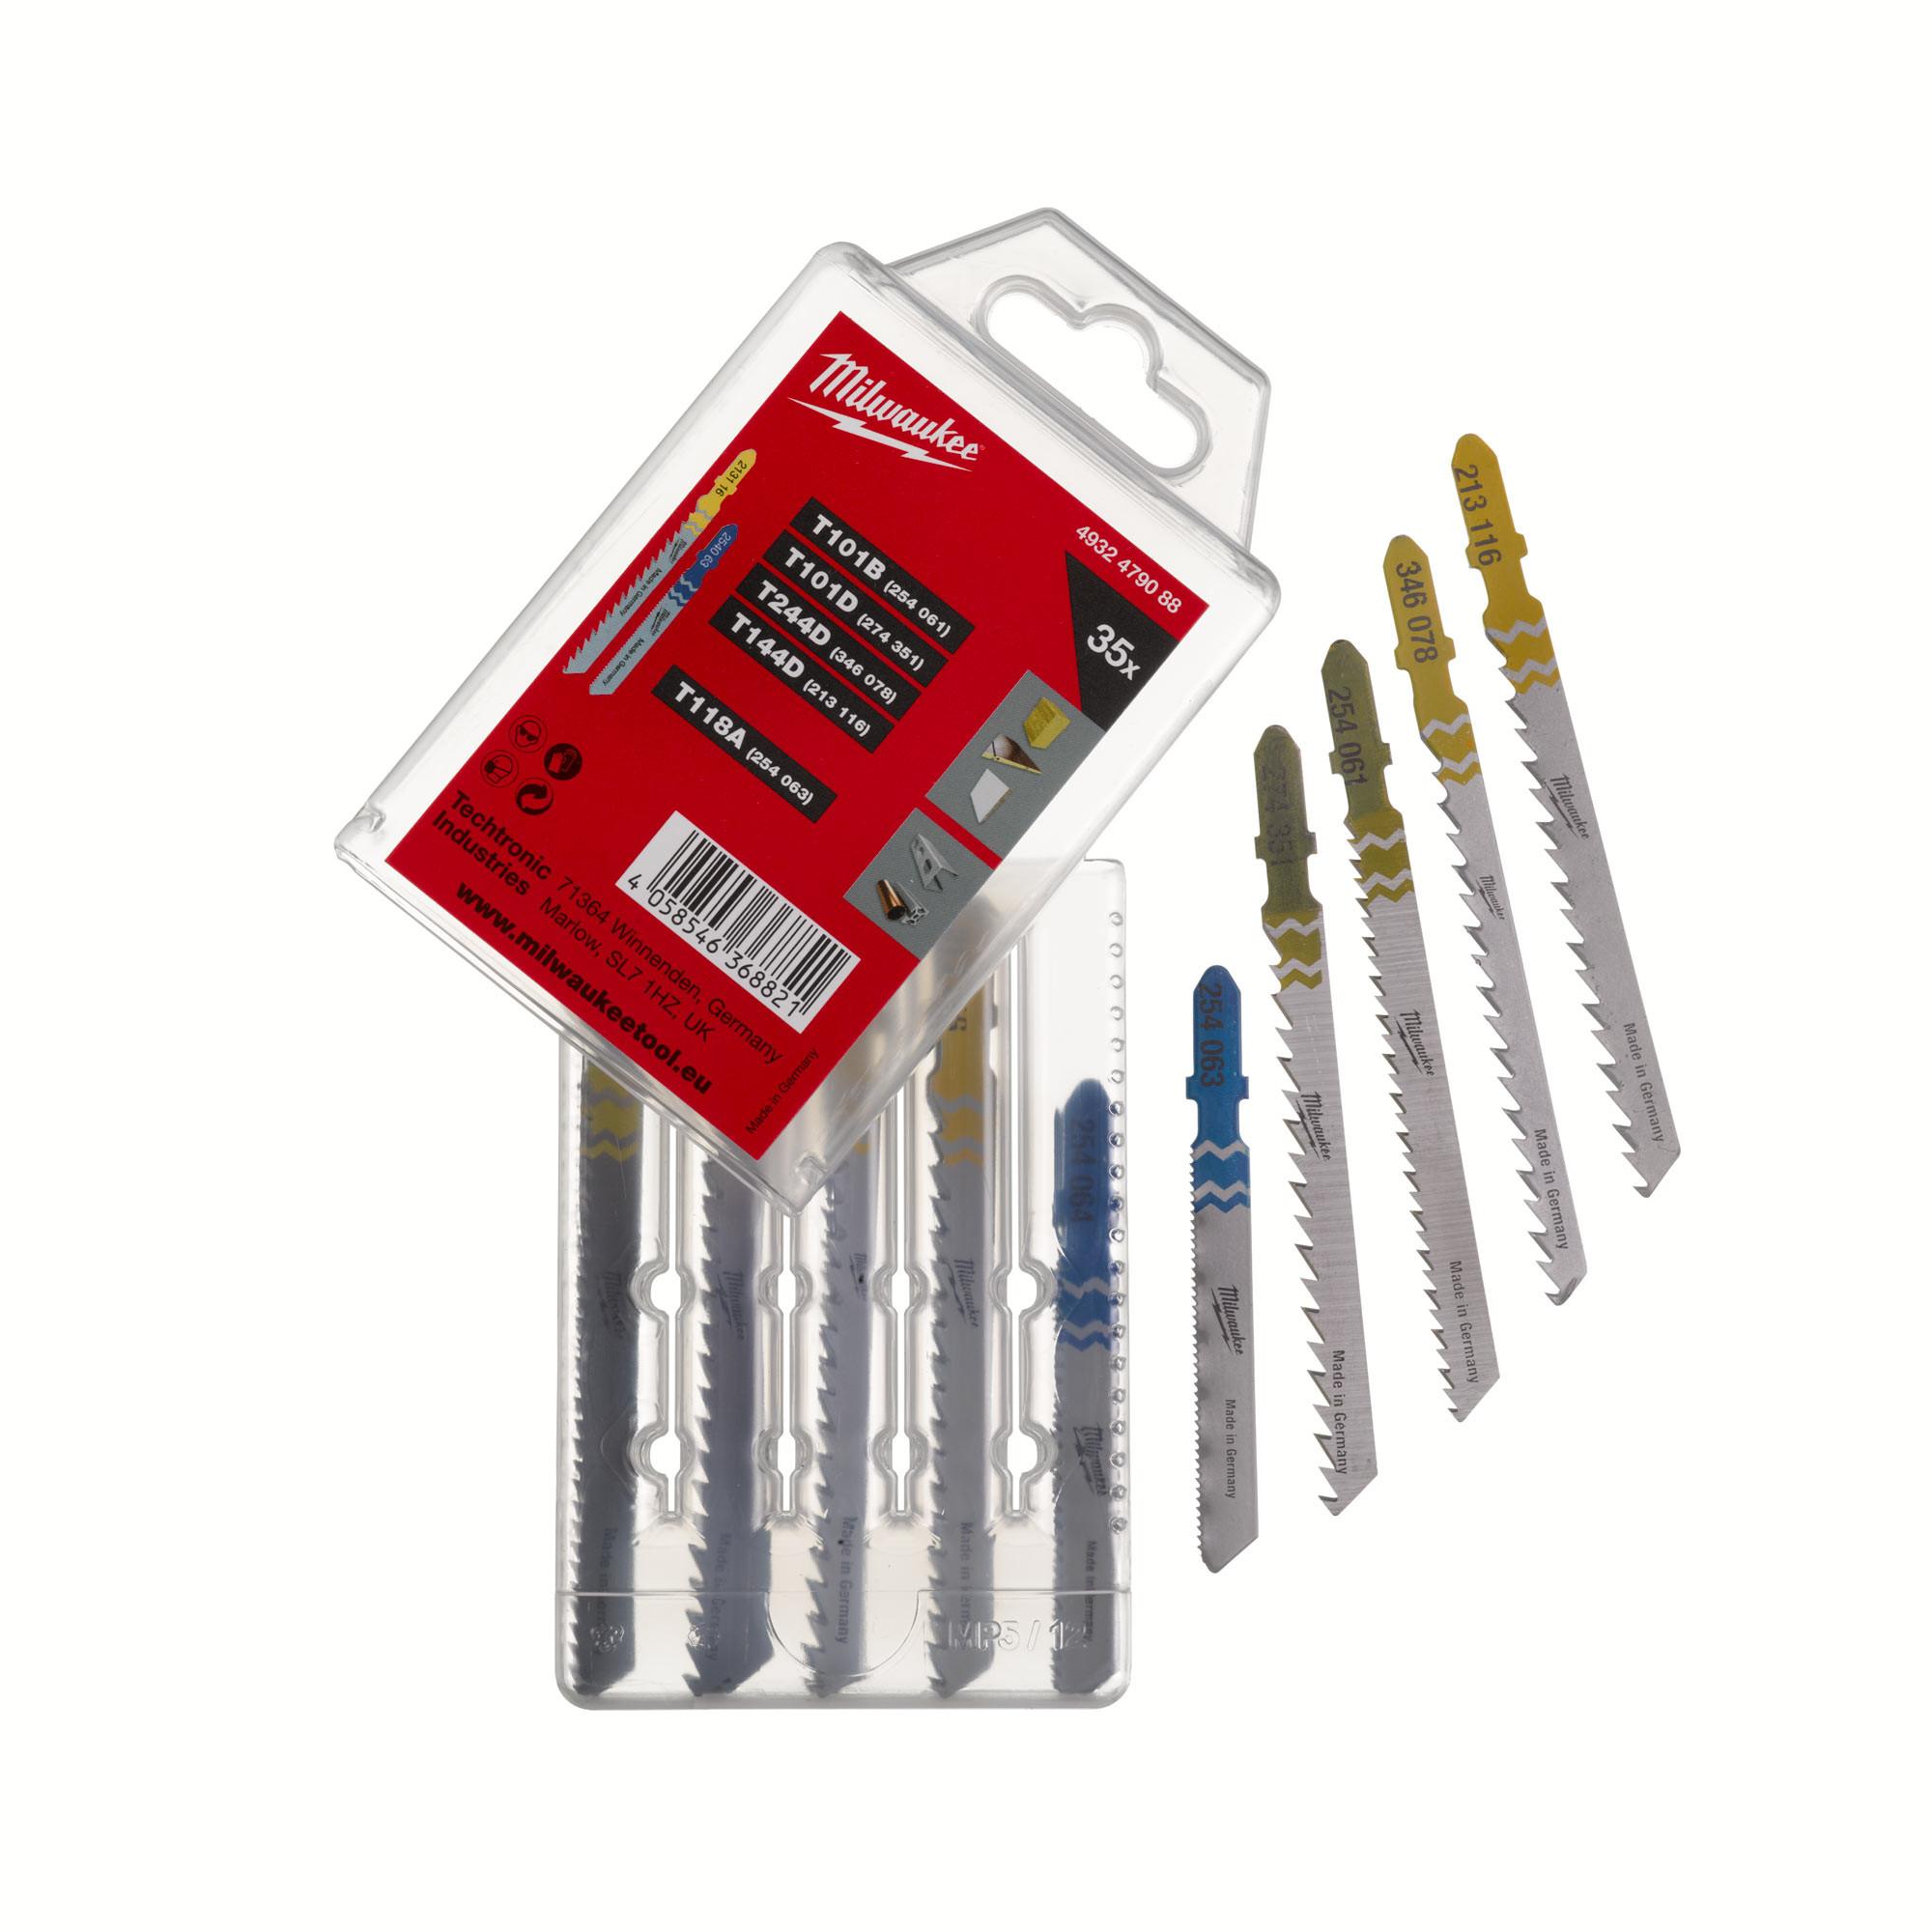 Milwaukee Jigsaw Blade Set - 33pc - 4932479088